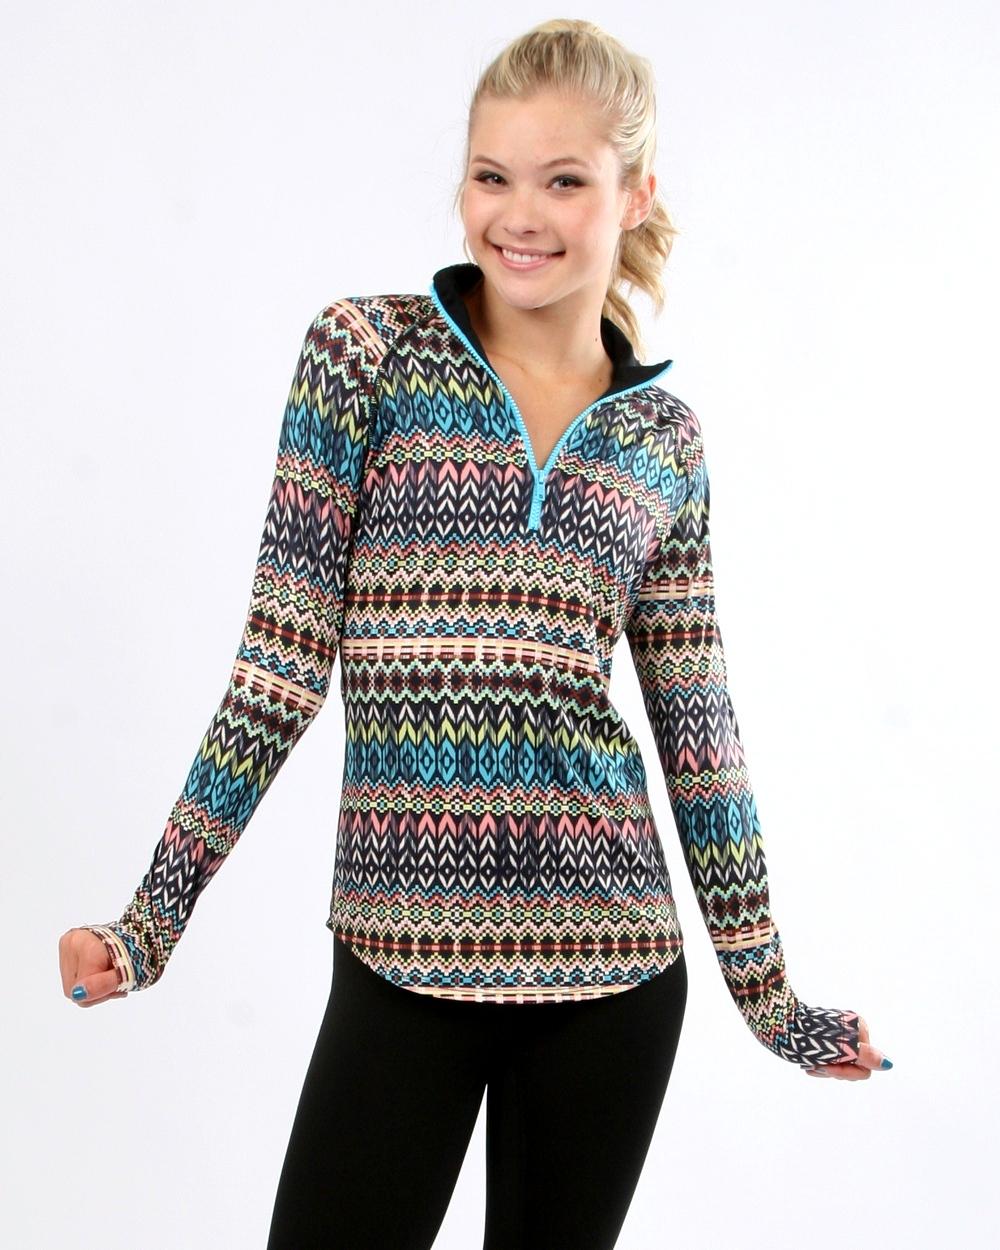 PRISMSPORT Aztec Long Sleeve Top Long Sleeve Shirts for Women